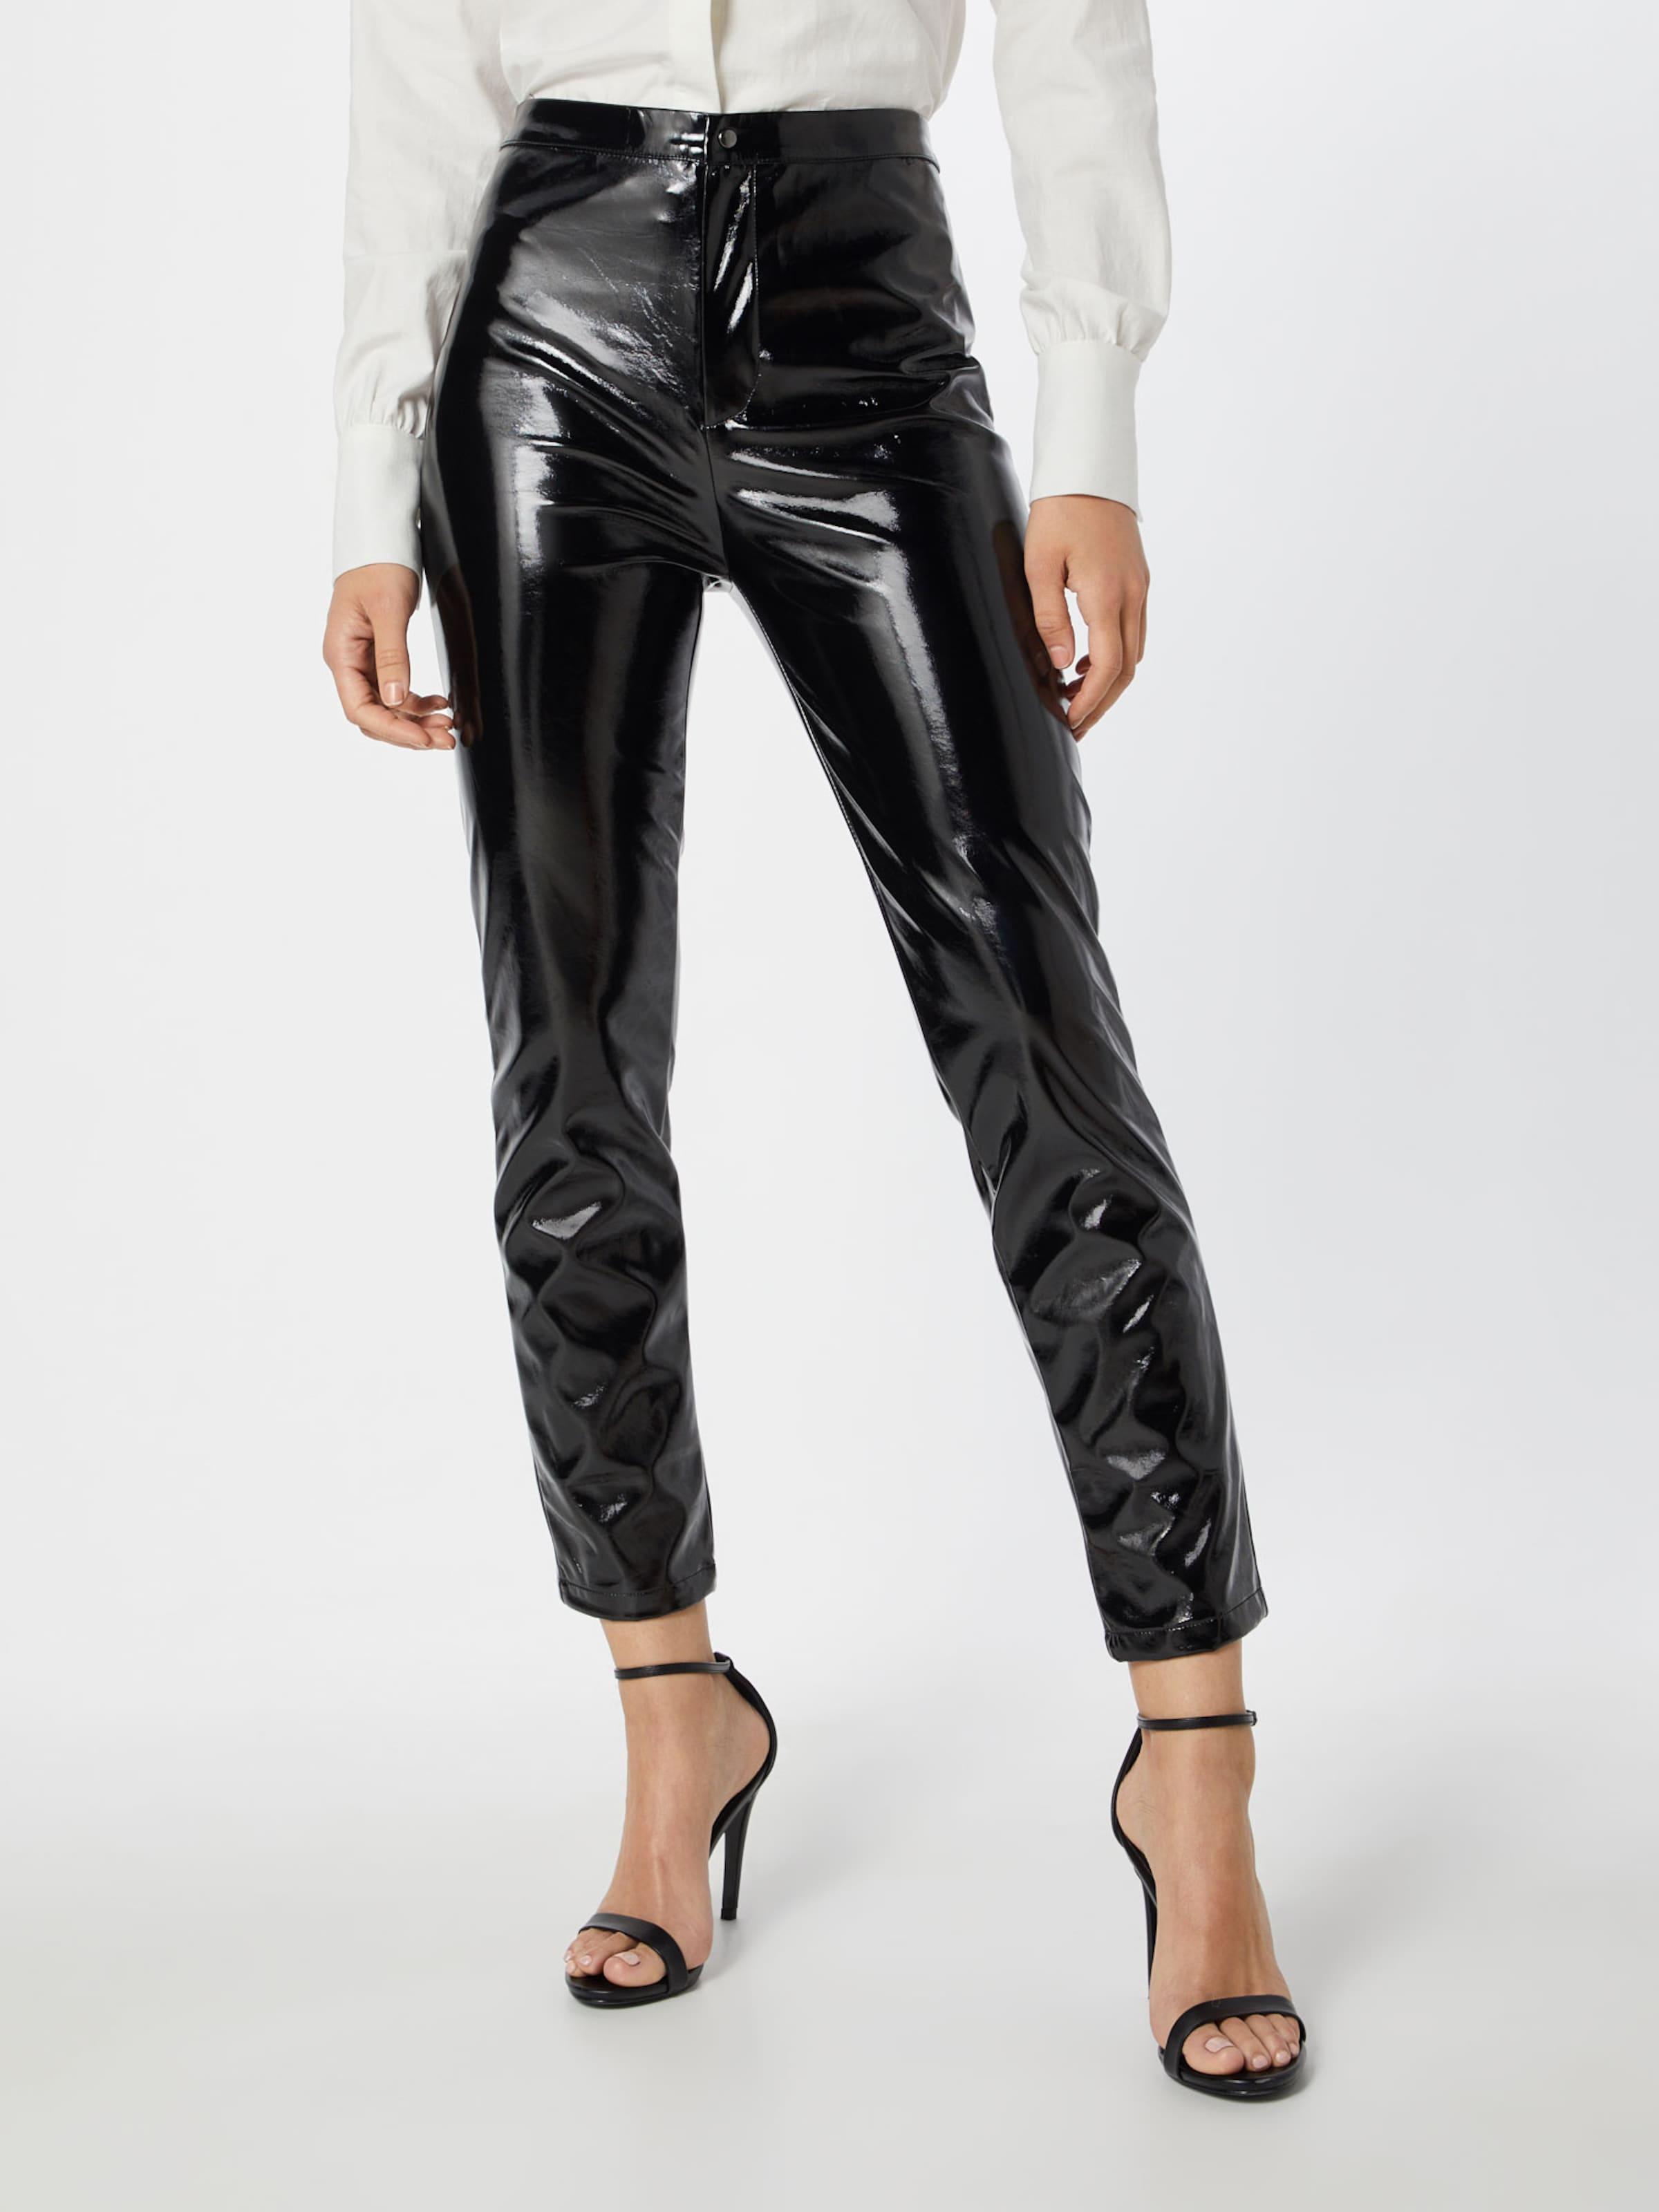 'shiny Pants' Schwarz In Na kd Hose kTPOXZiu